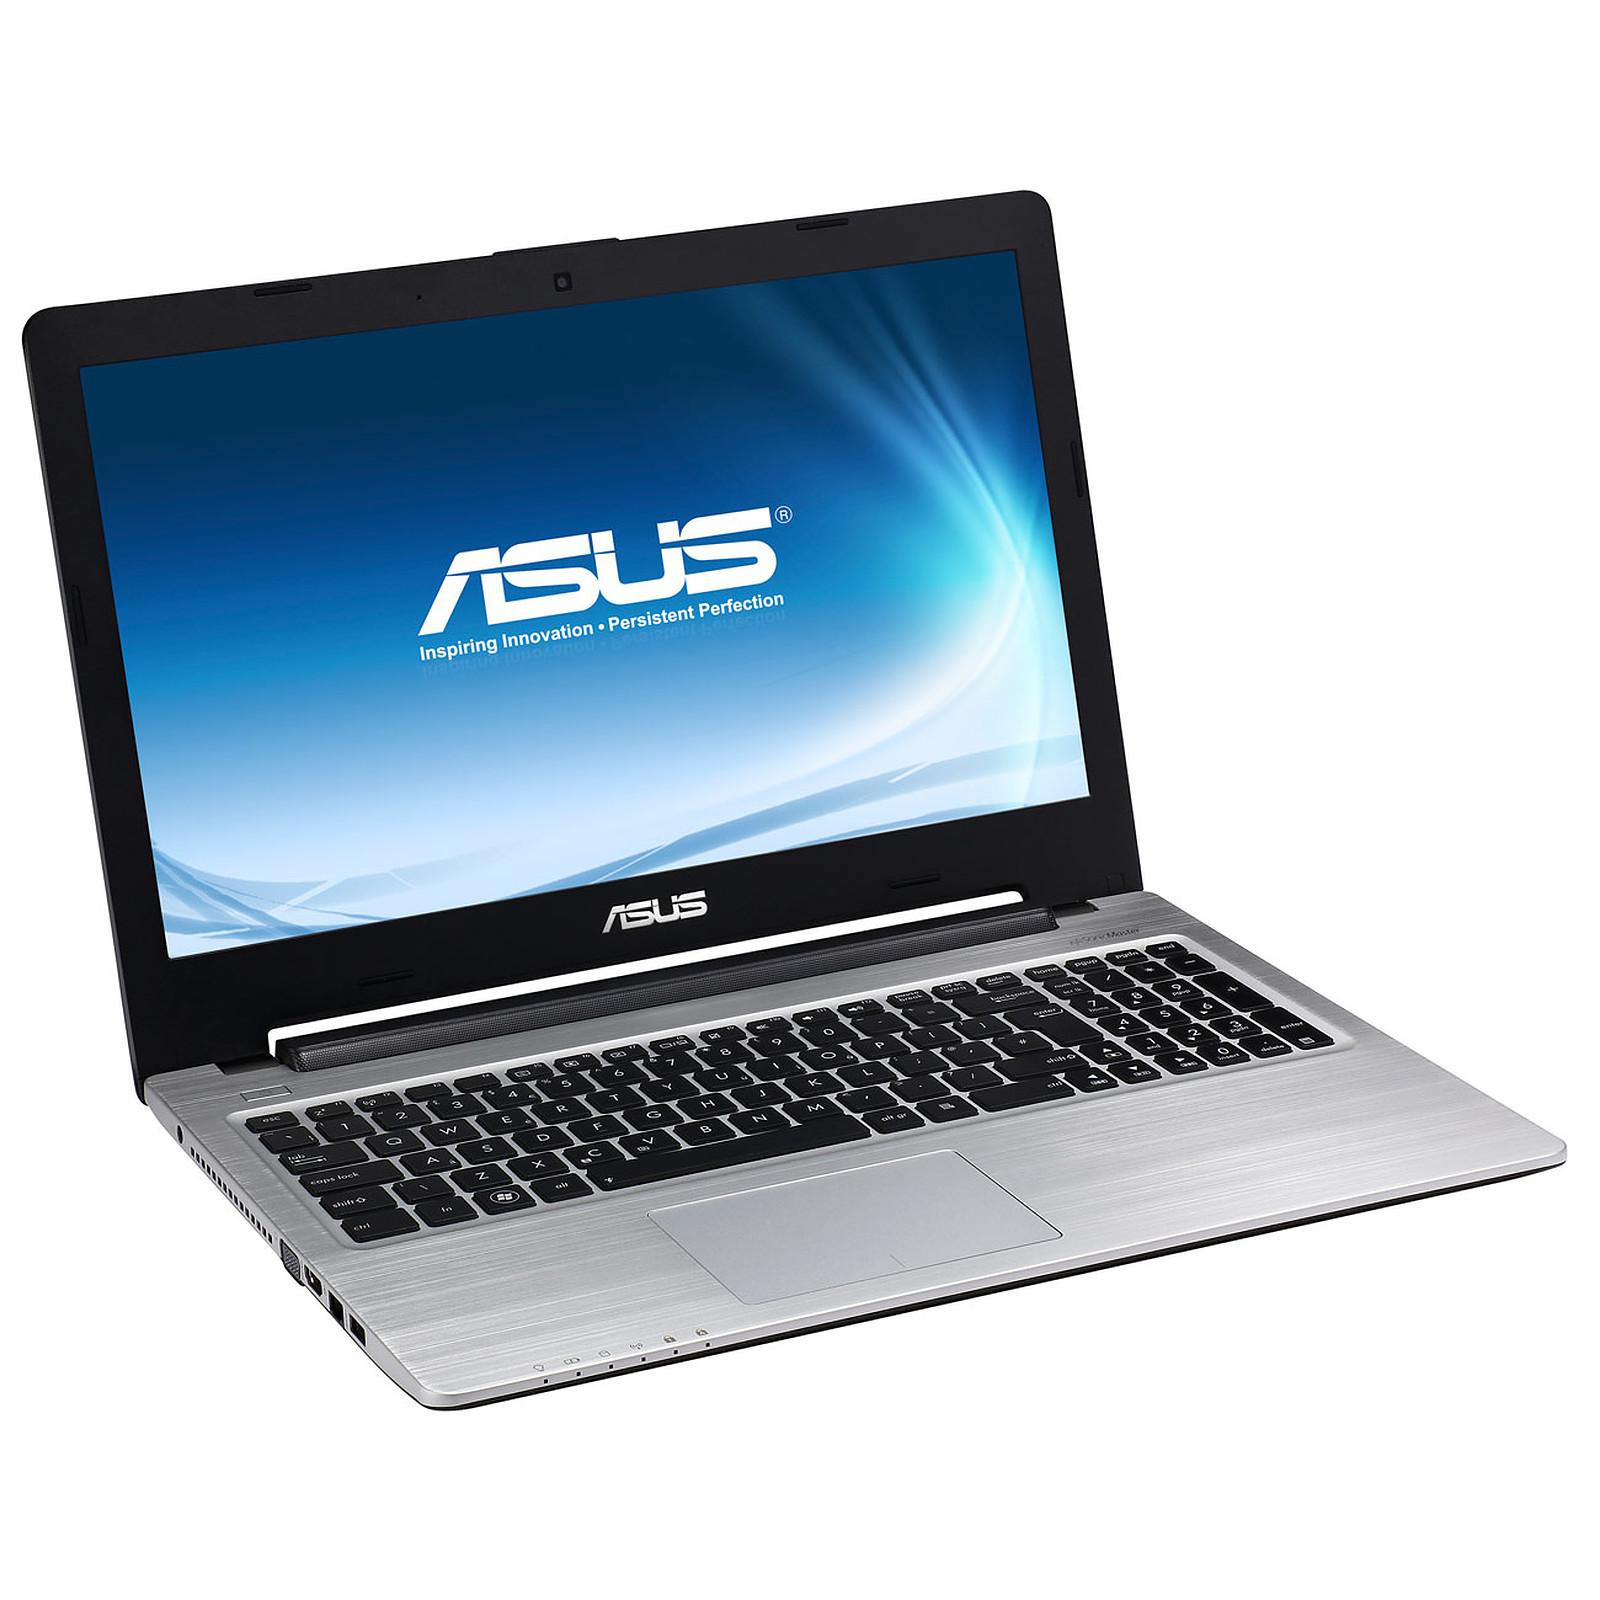 ASUS S56CA-XX051P Slim